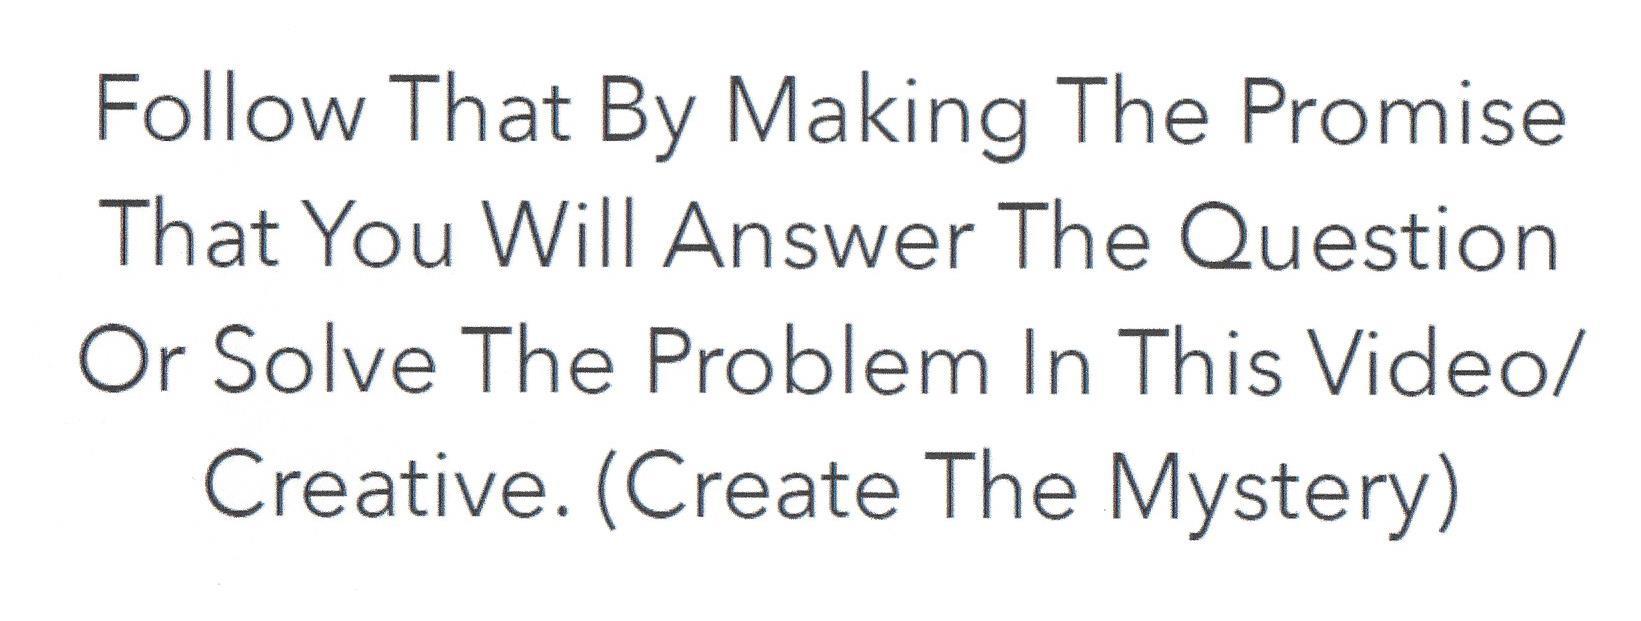 Joe Polish - Promise Answers-Solve Question or Problem.jpg